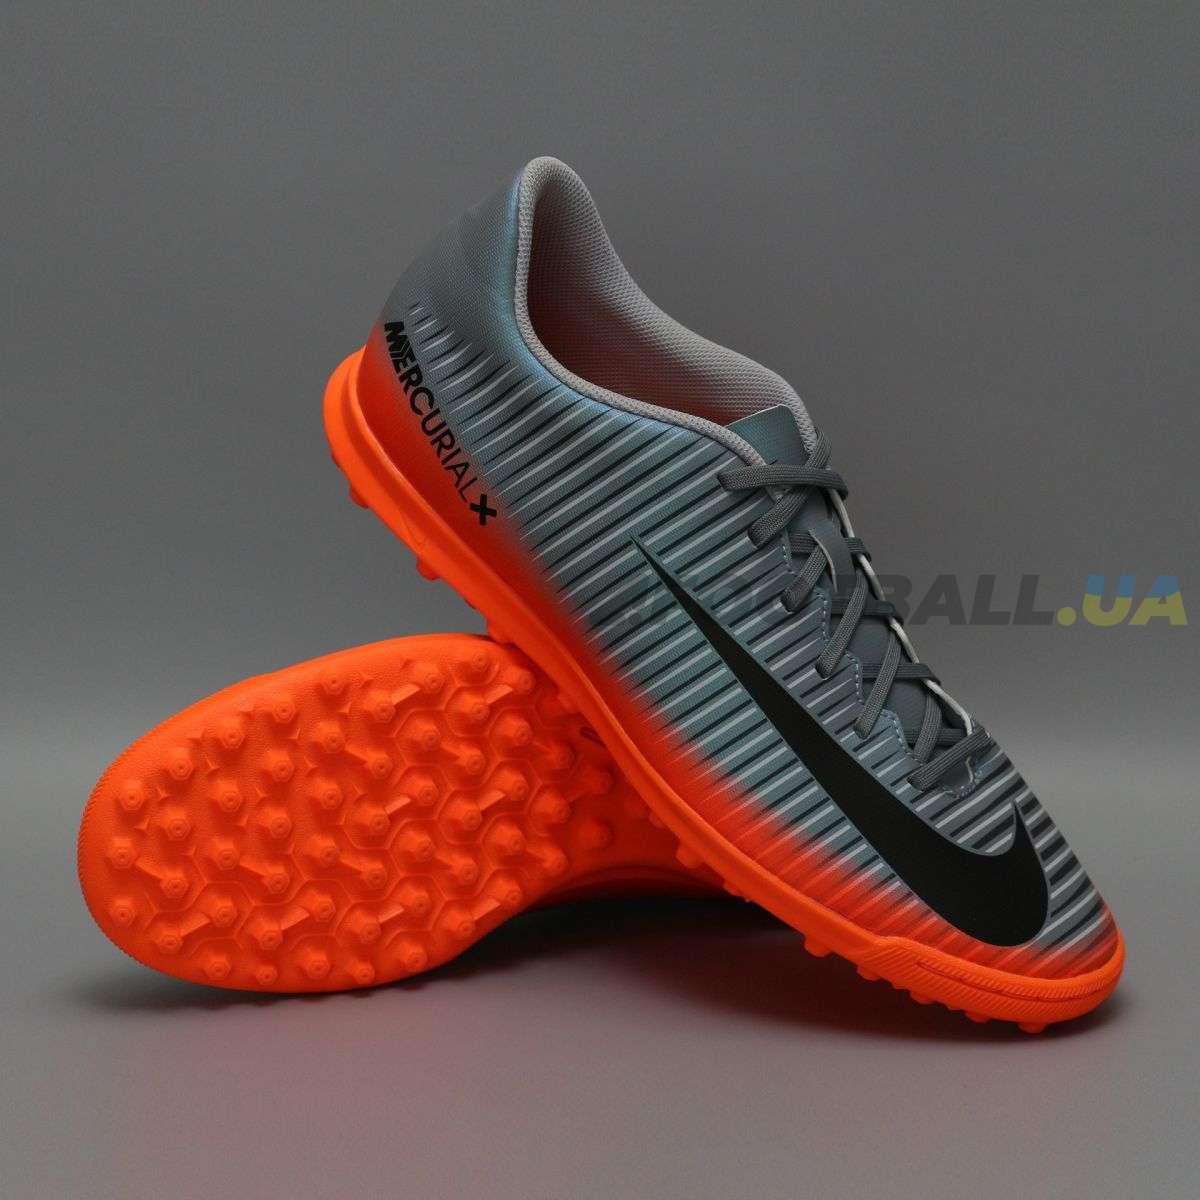 04c5d498 Сороконожки NIKE MERCURIALX VORTEX III CR7 TF 852534-001 купить на ...